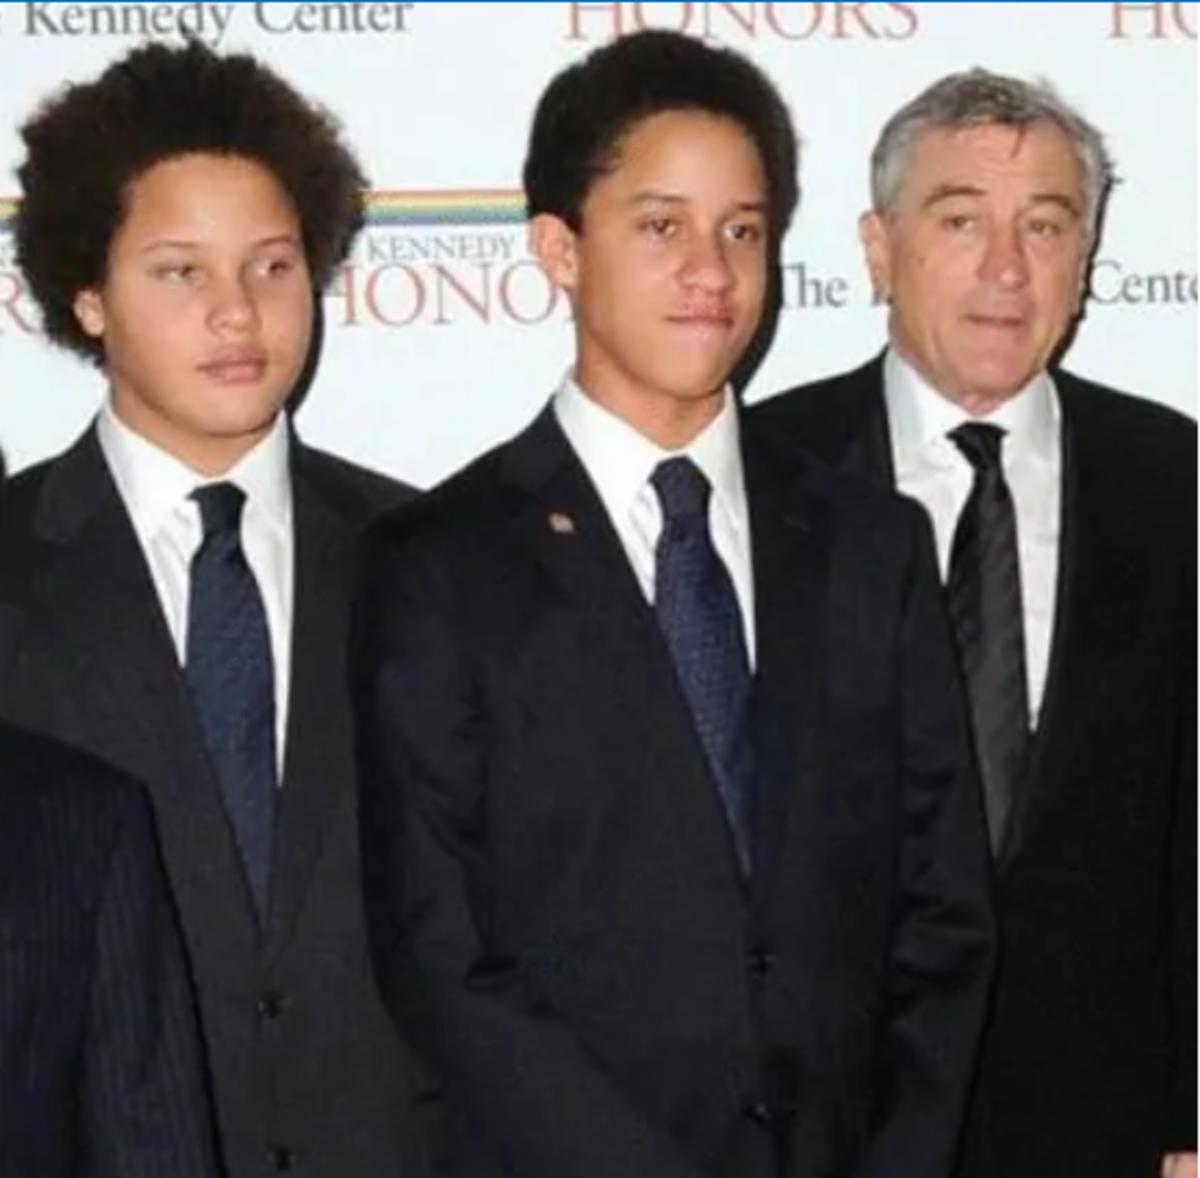 Robert De Niro with his two sons, Aaron and Julian.